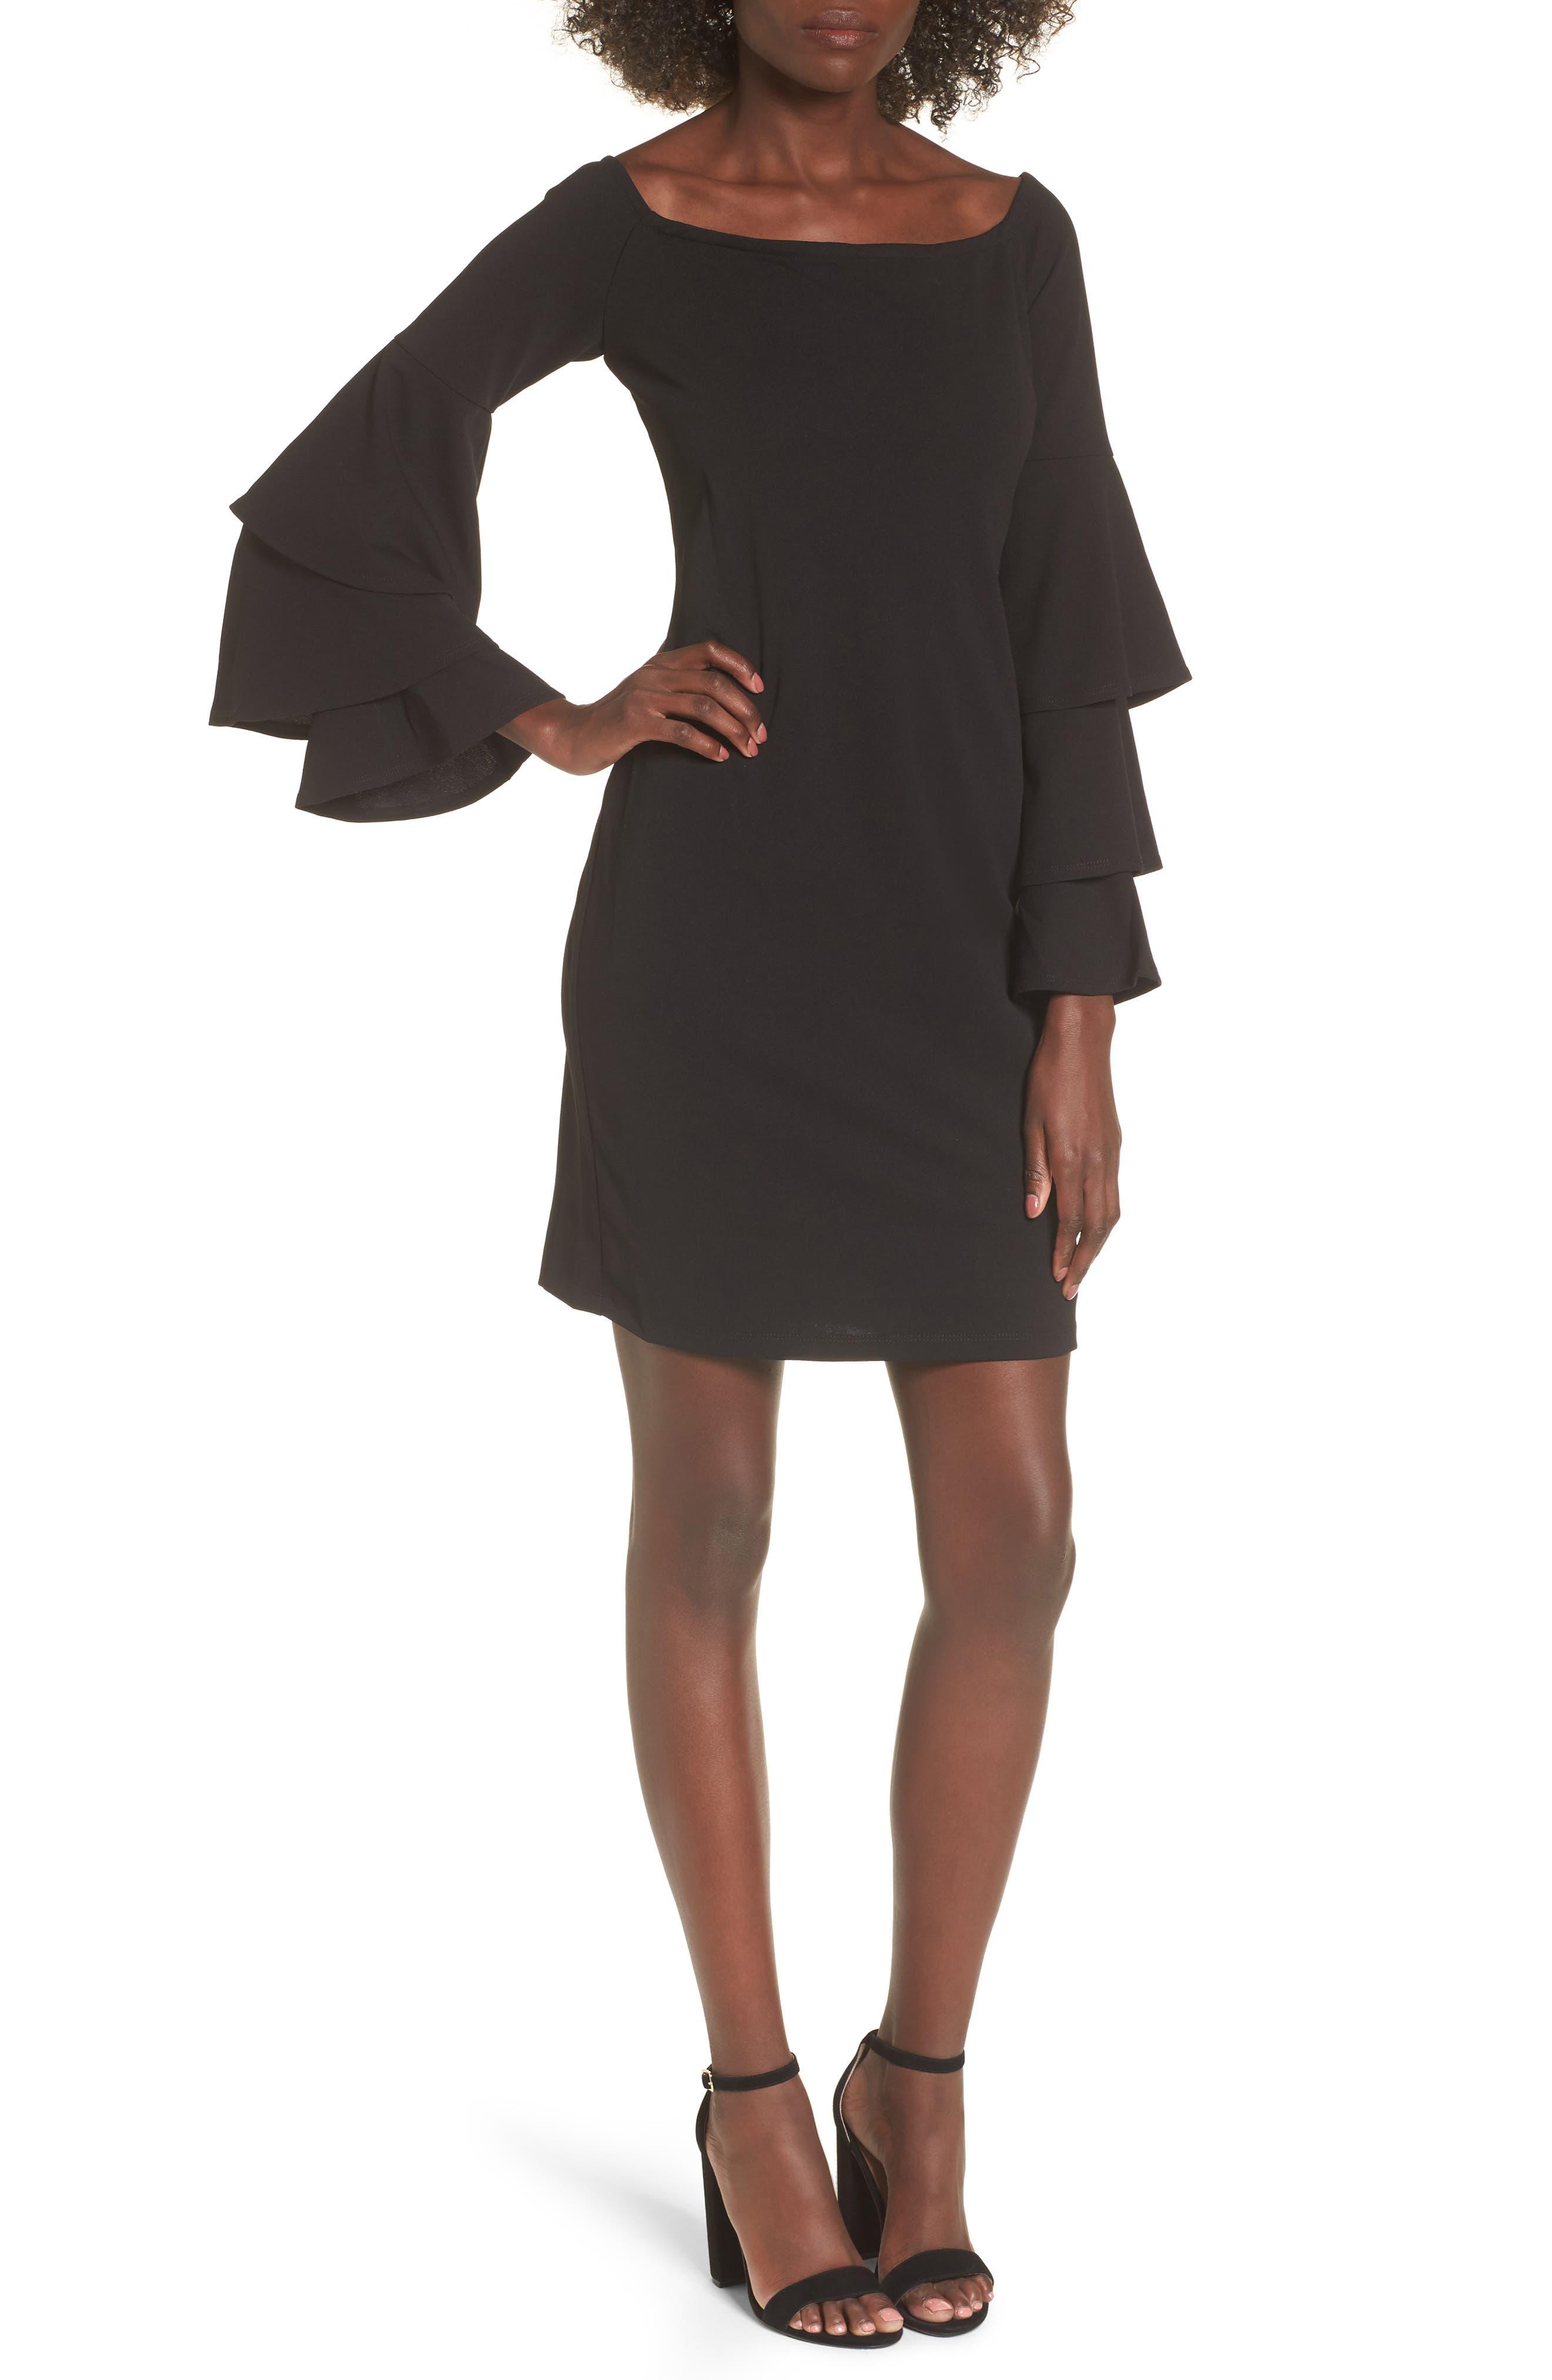 Ruffle Sleeve Off the Shoulder Dress,                             Main thumbnail 1, color,                             Black